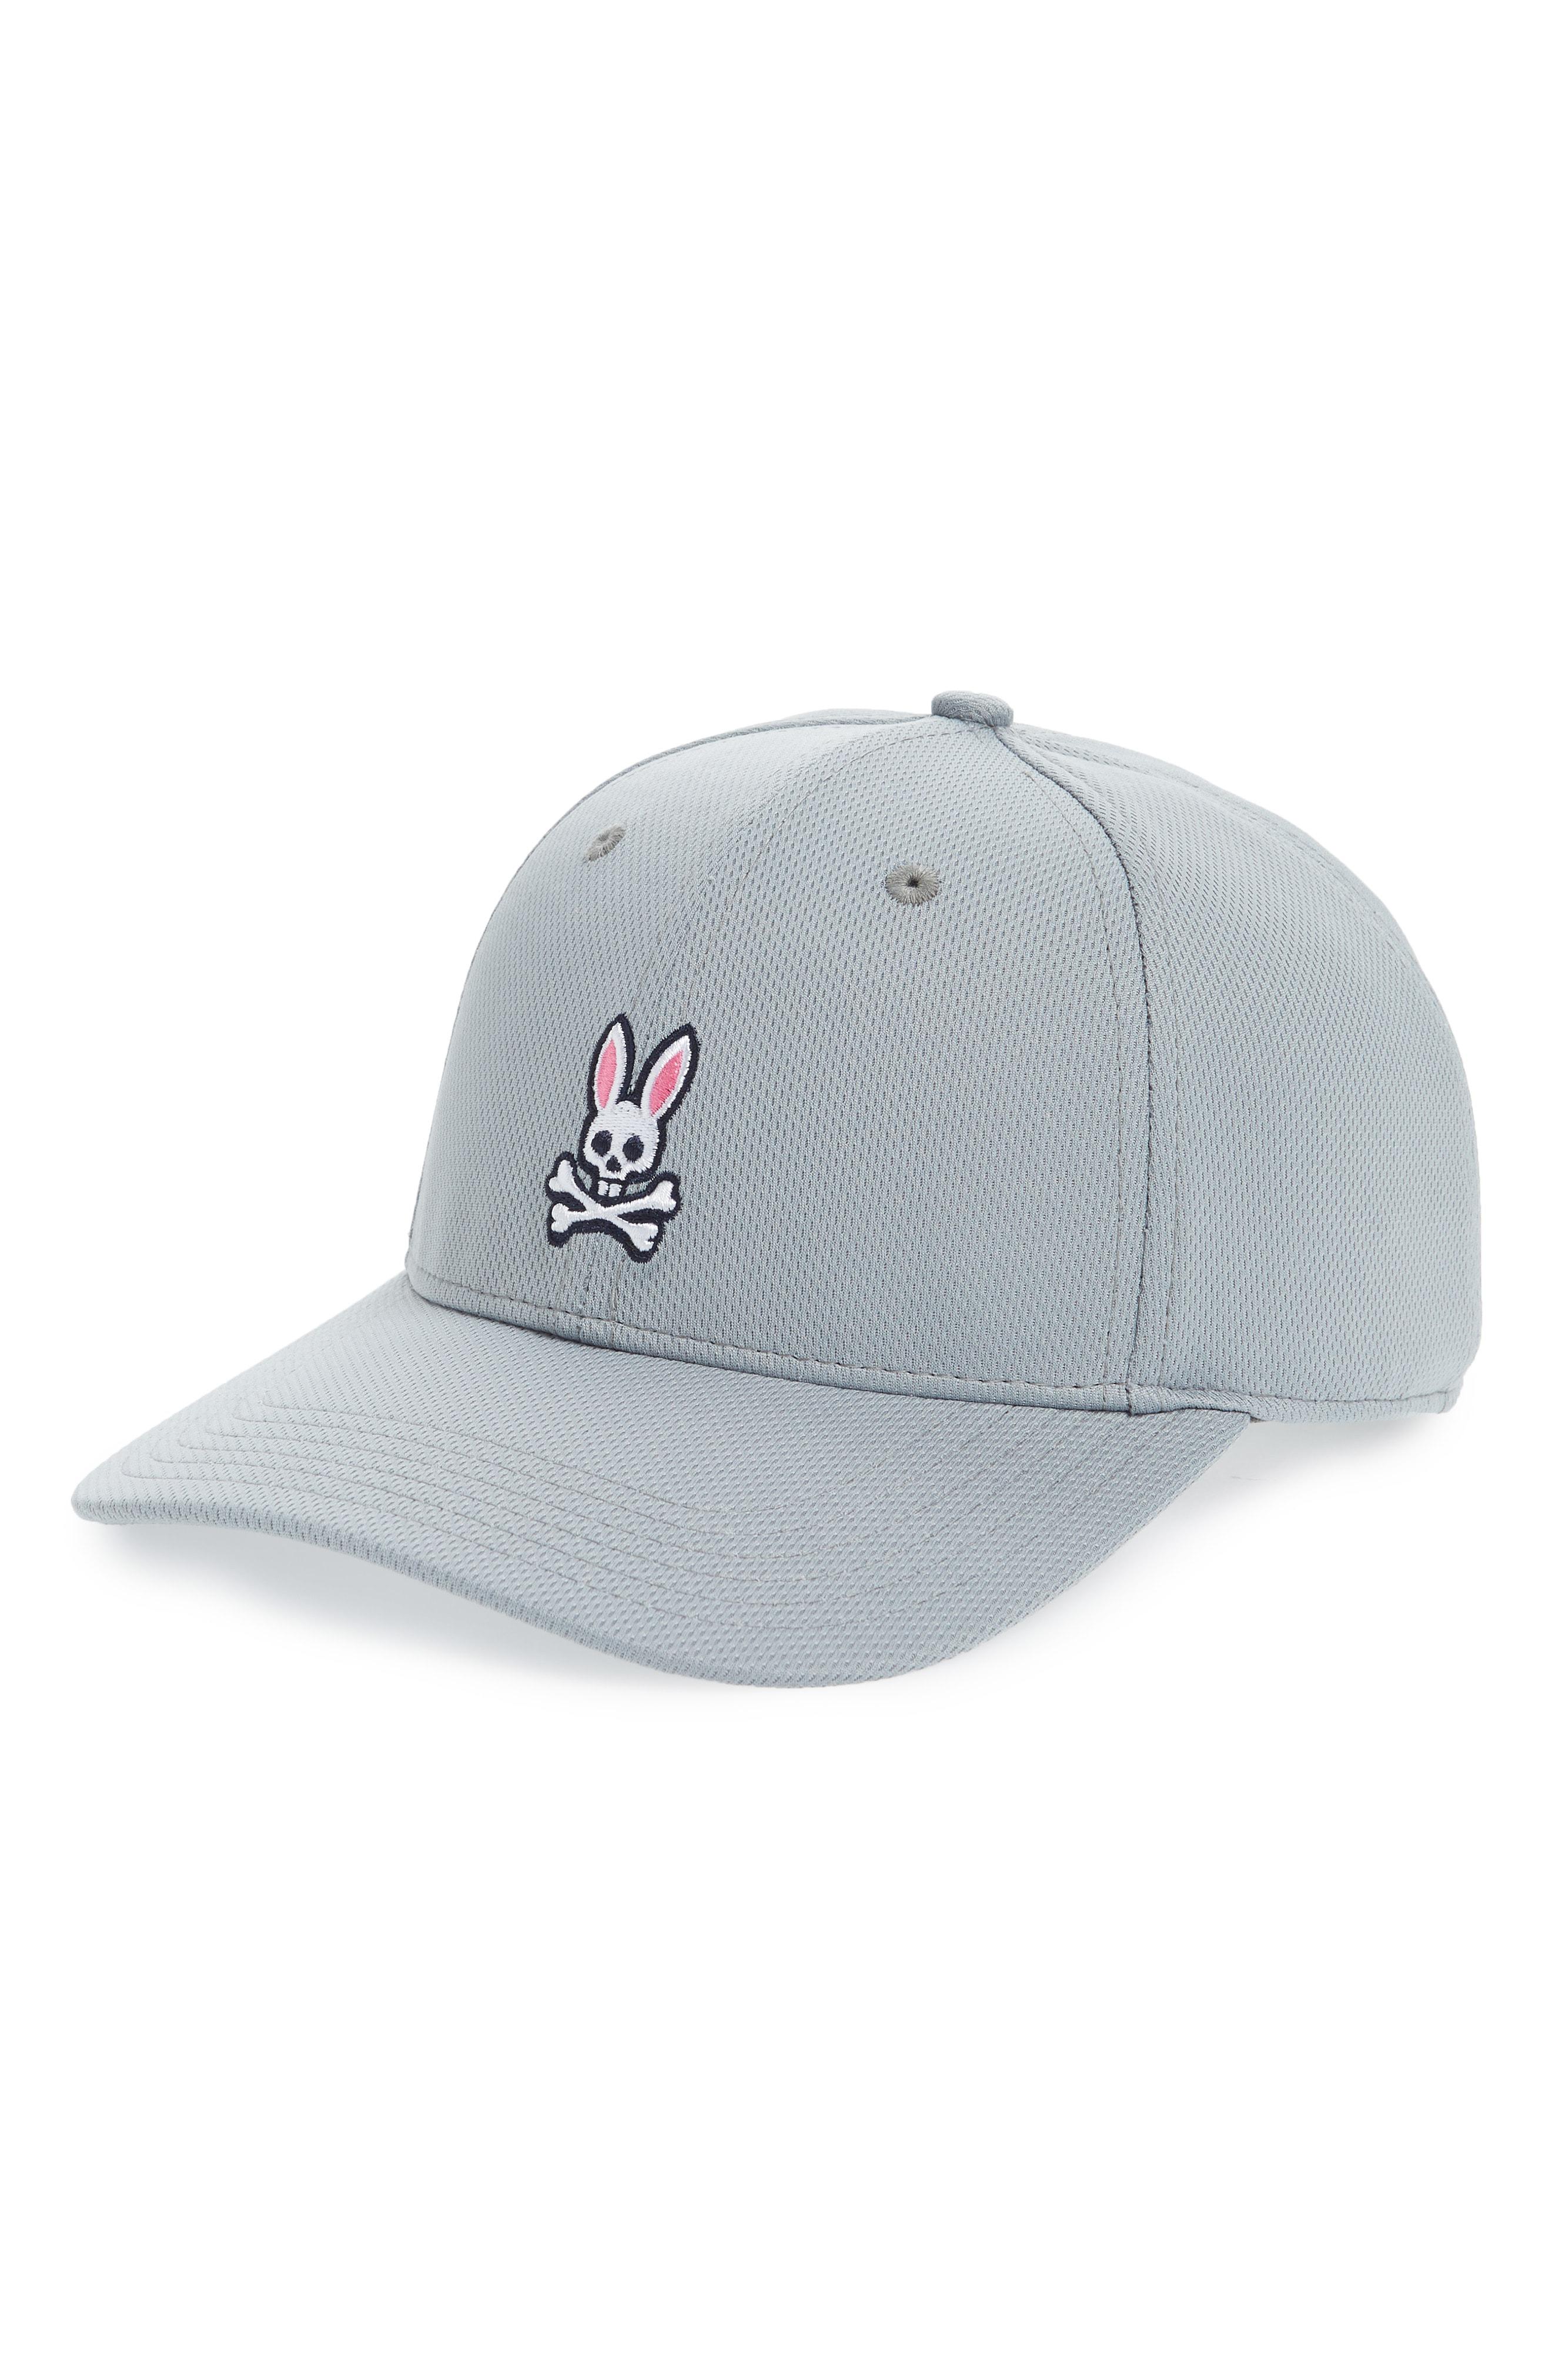 16a868d5763 Psycho Bunny Sport Ball Cap - Grey In Shark